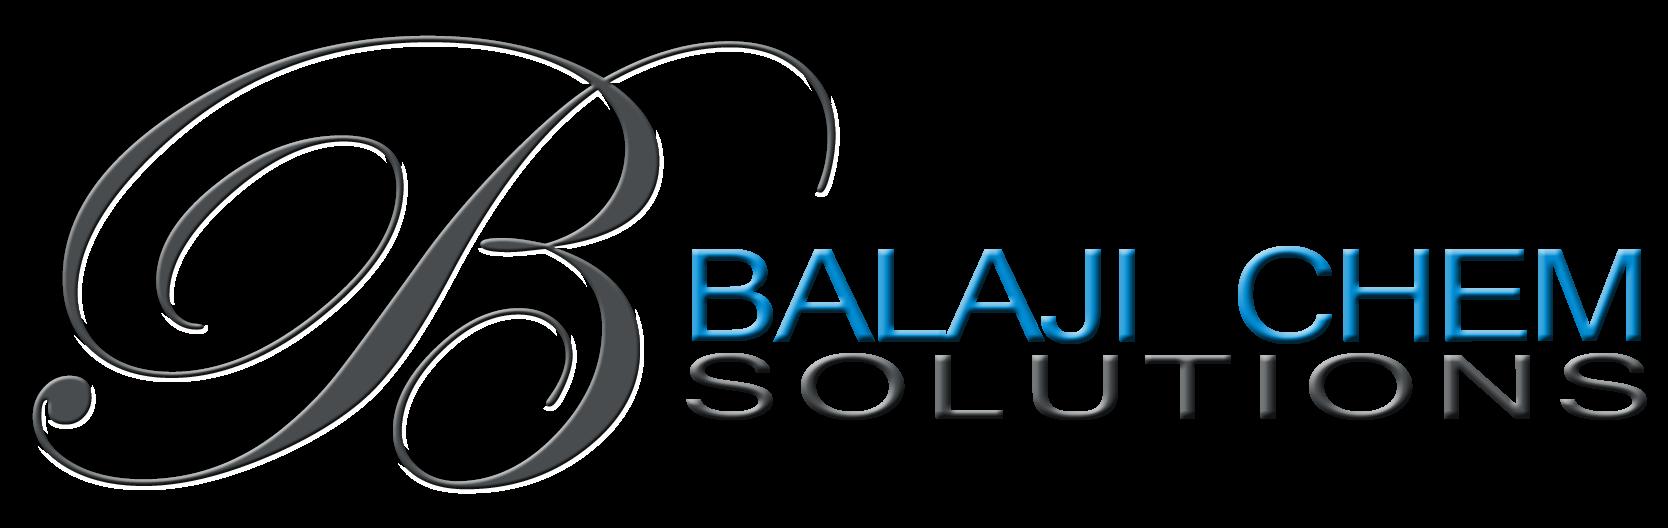 Balaji Chem Solutions